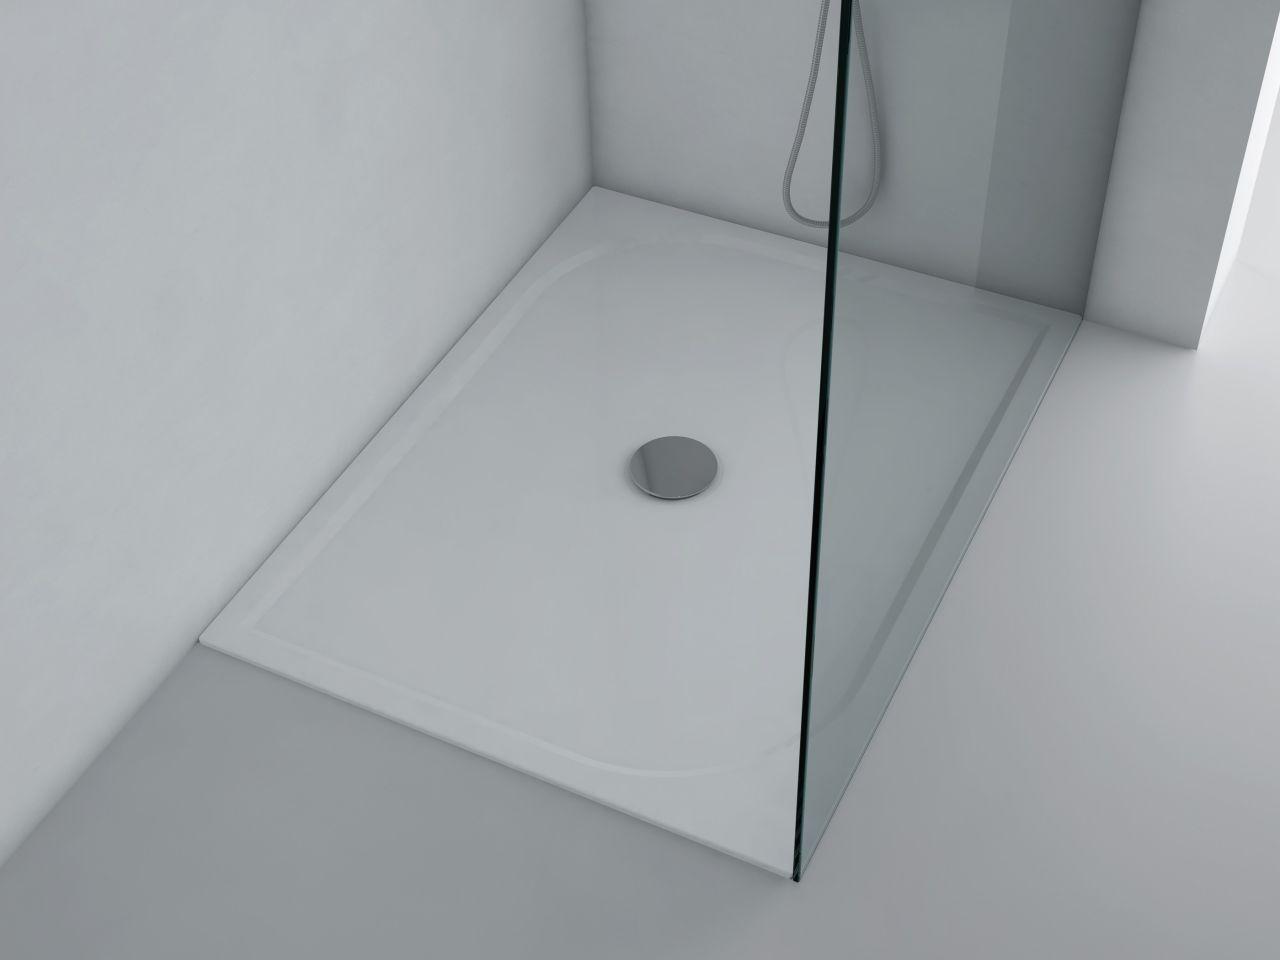 duschwanne 120x90cm andria mineralguss duschtasse flach bodengleich inkl f e u ebay. Black Bedroom Furniture Sets. Home Design Ideas